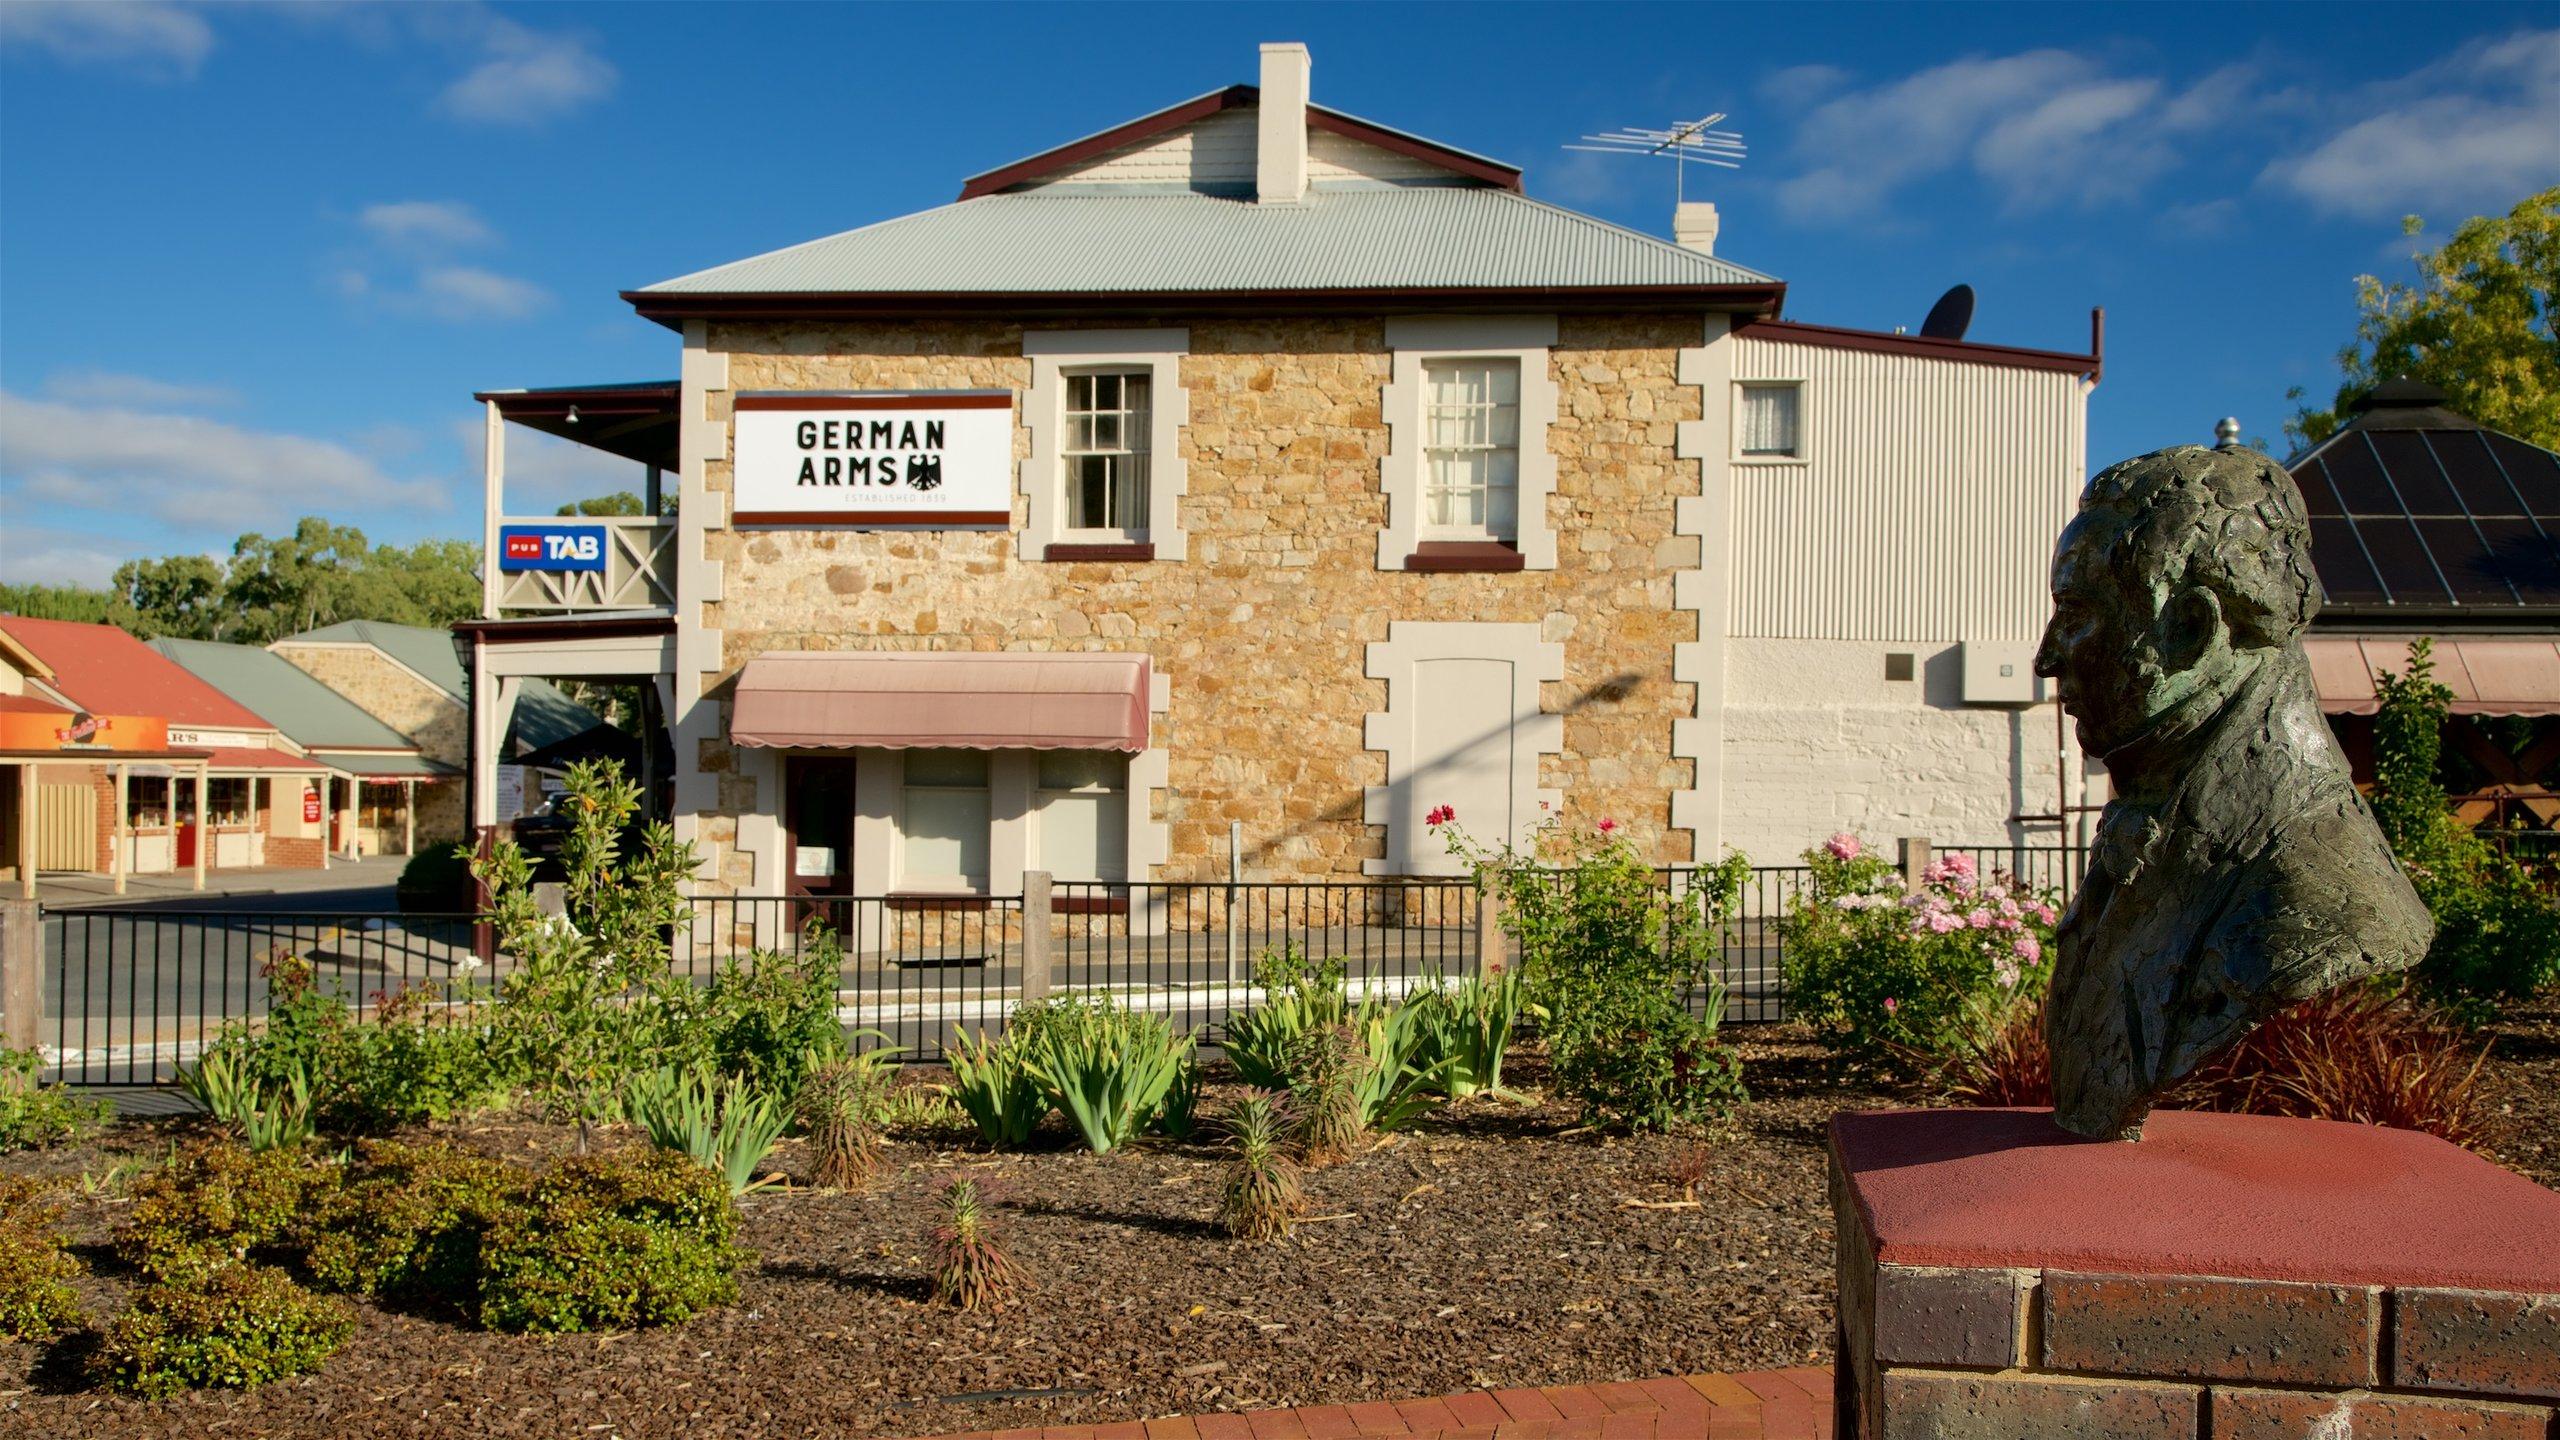 Hahndorf, Adelaide, South Australia, Australië